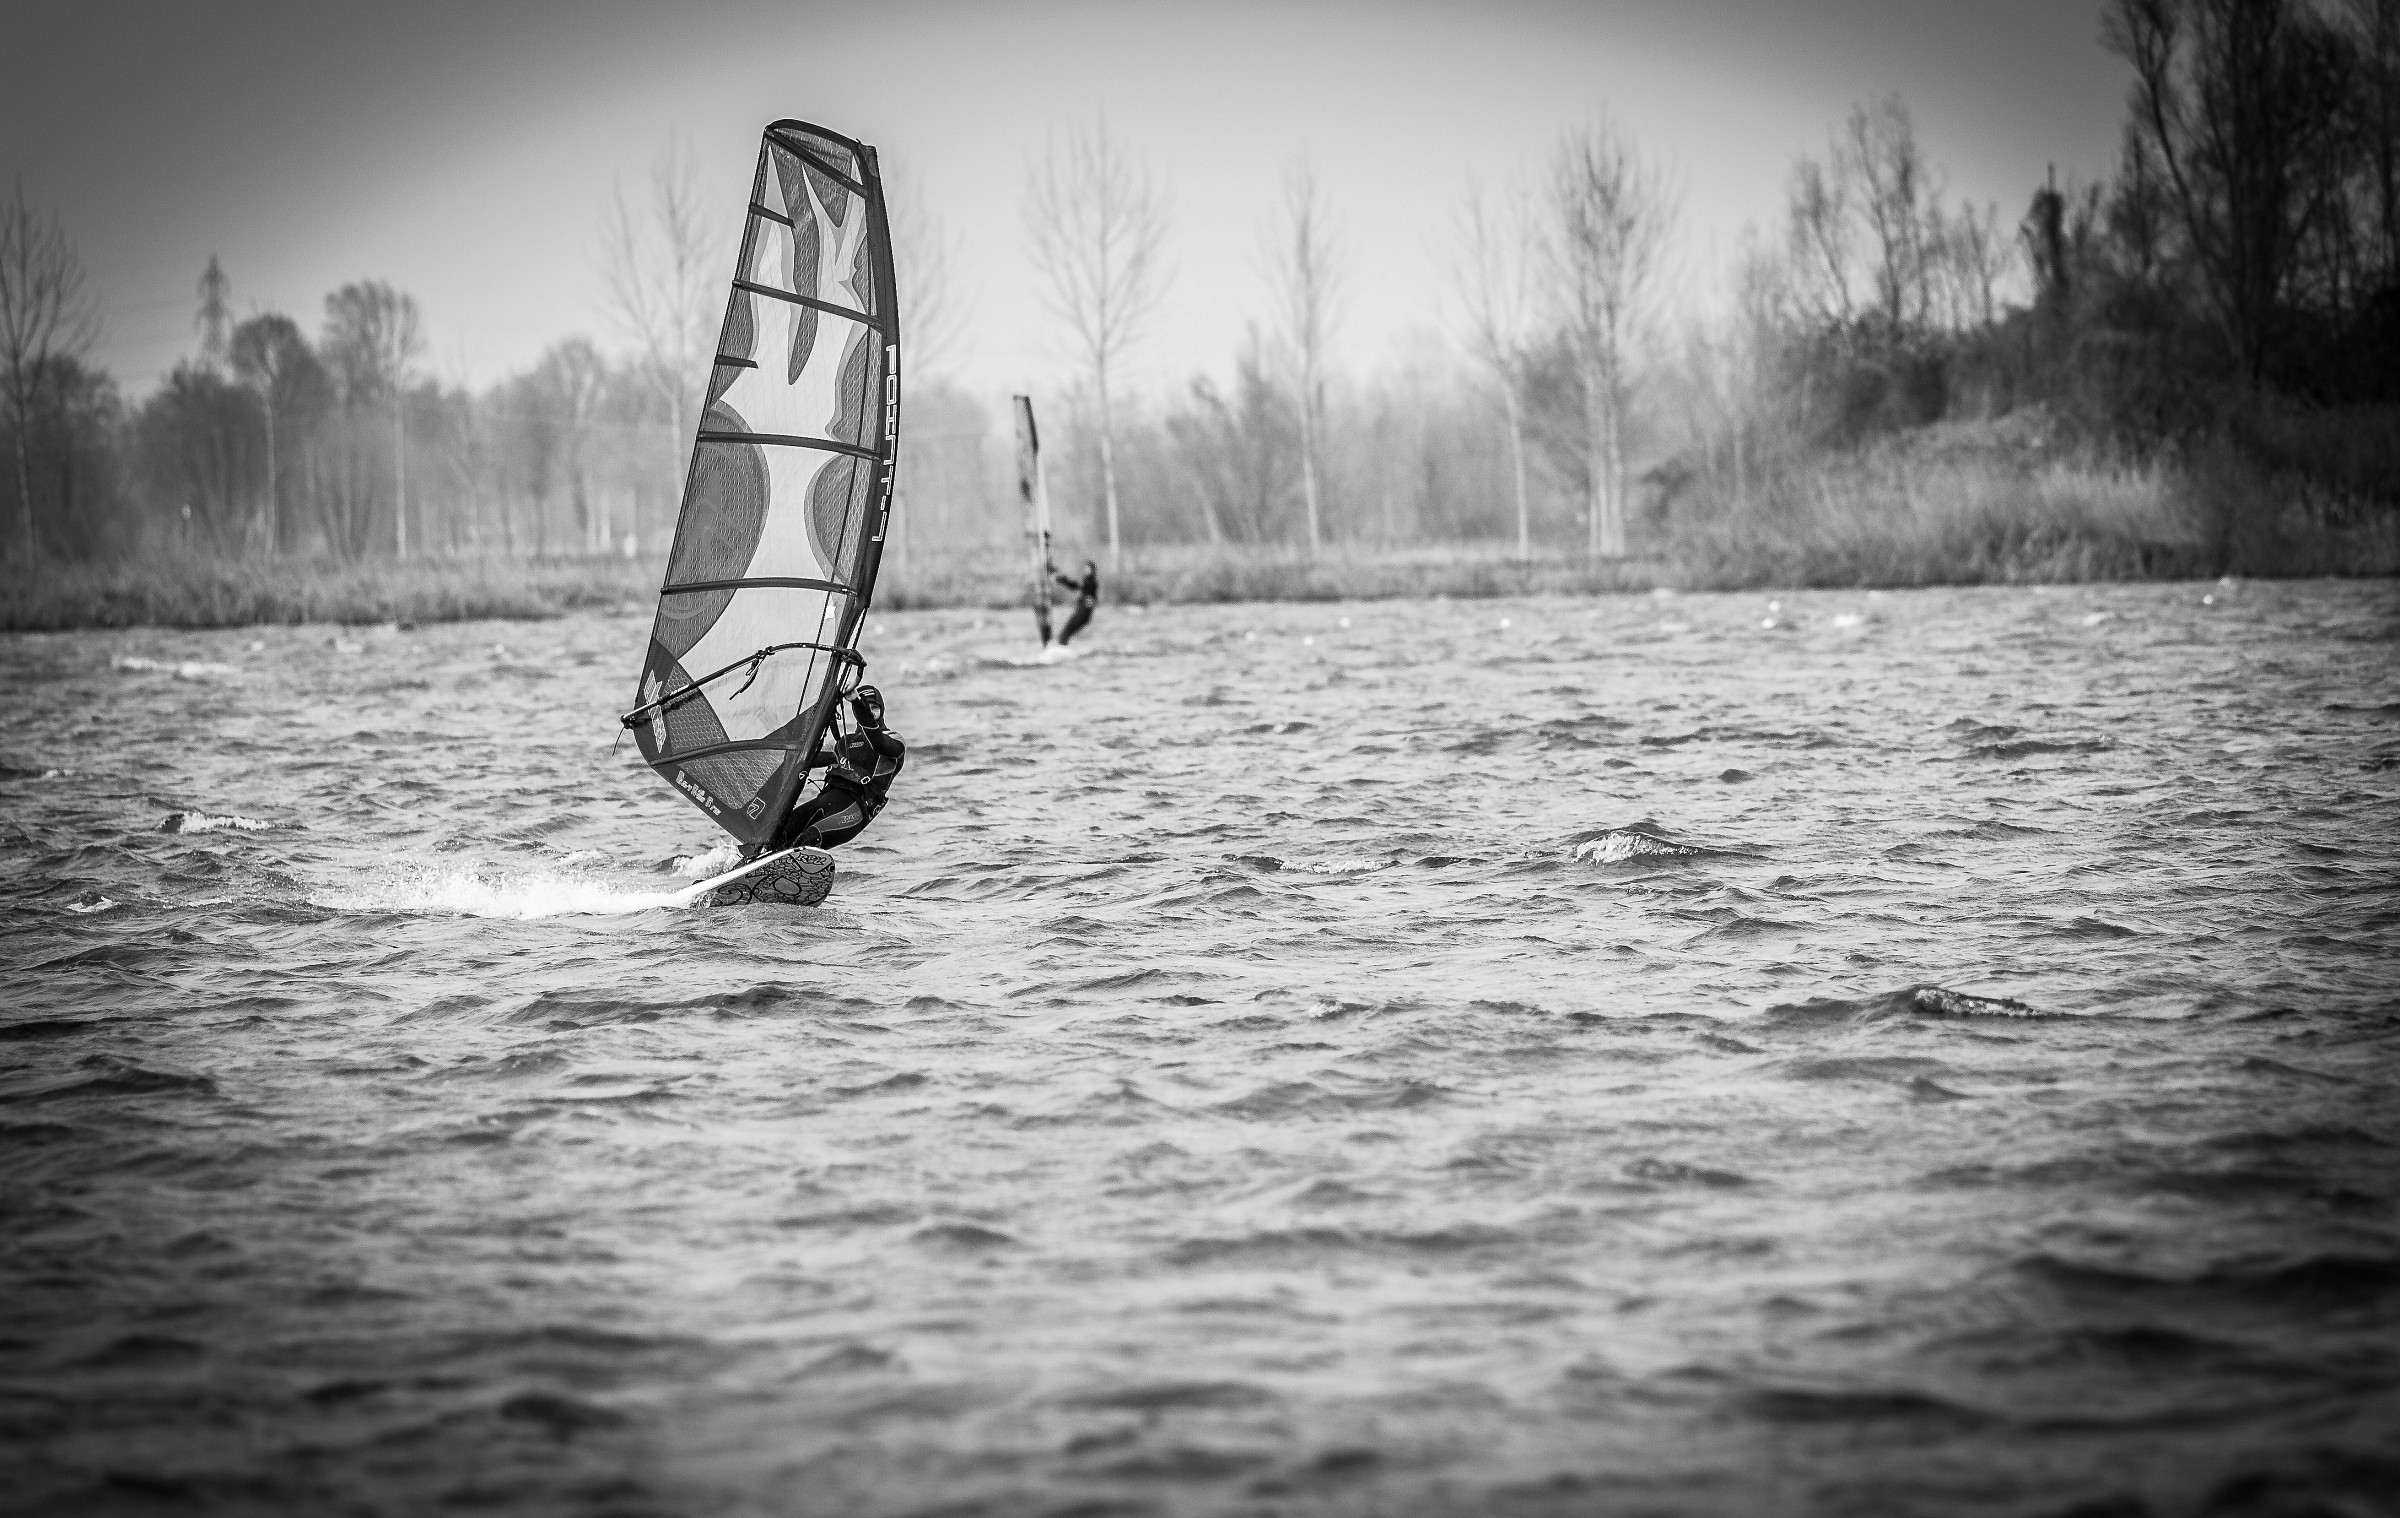 Windsurfing on Lake Mantova...